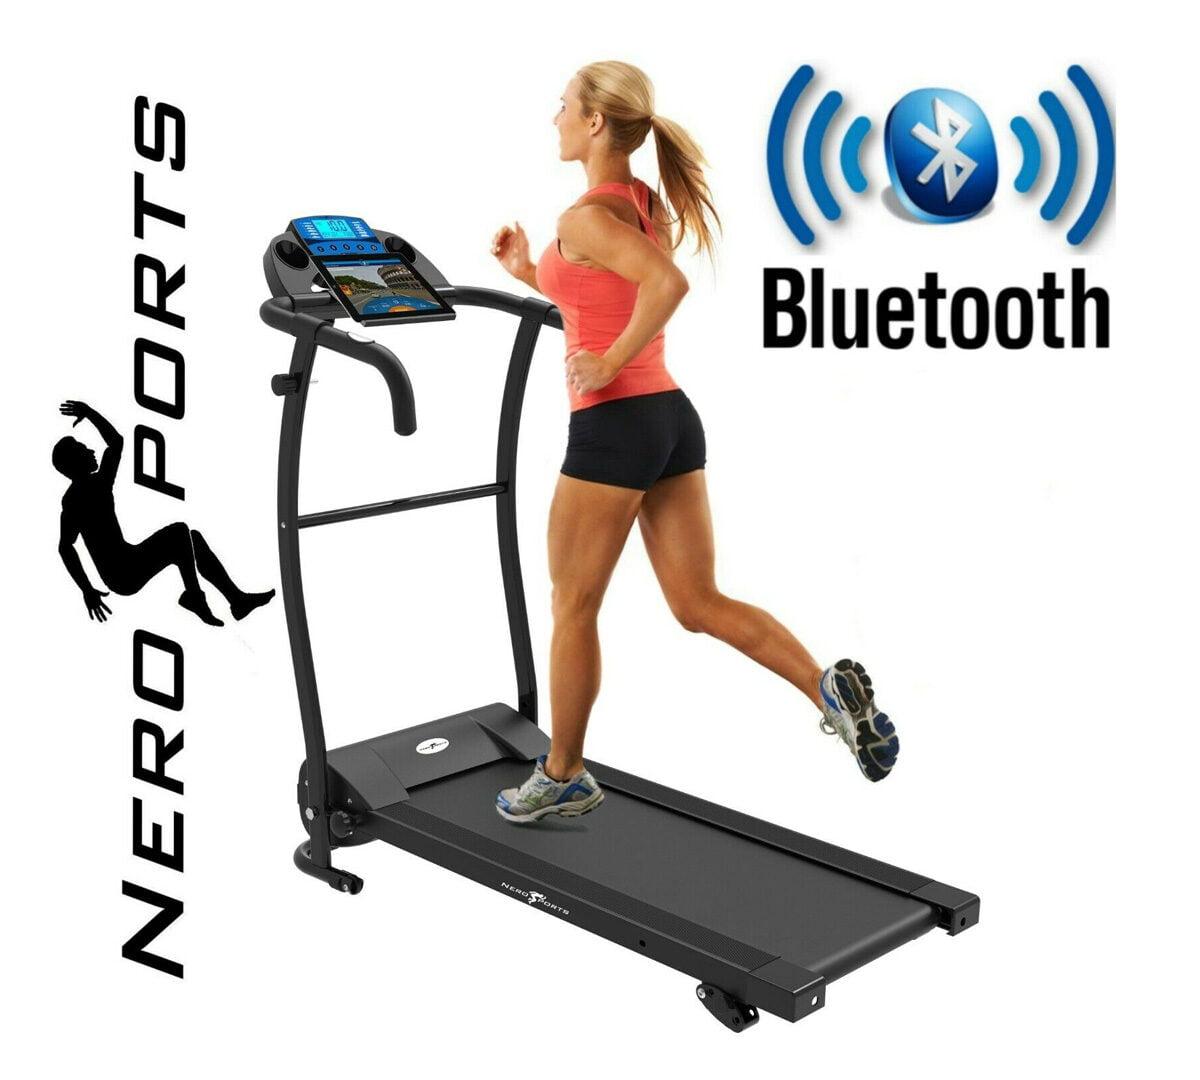 Women on Nero Sports Foldable Treadmill voucher code